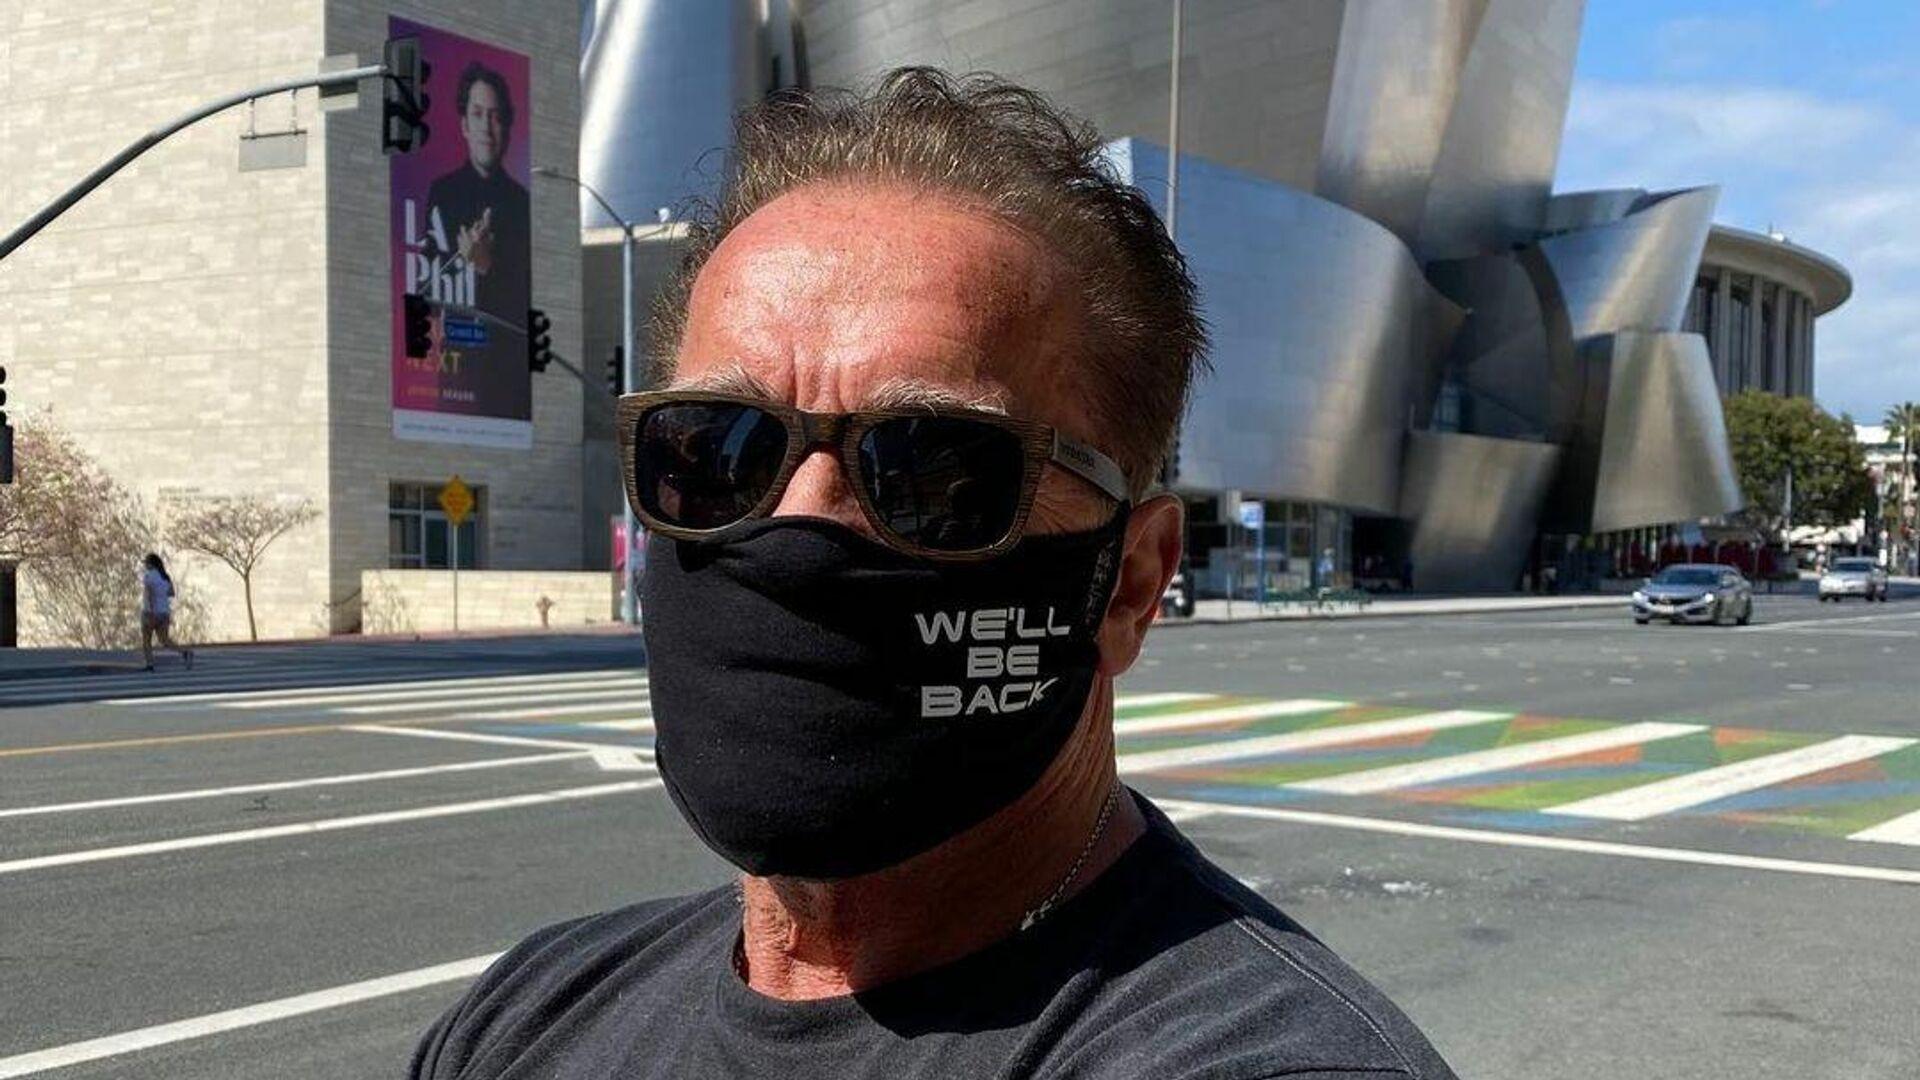 Arnold Schwarzenegger frente al Walt Disney Concert Hall en Los Ángeles - Sputnik Mundo, 1920, 13.08.2021